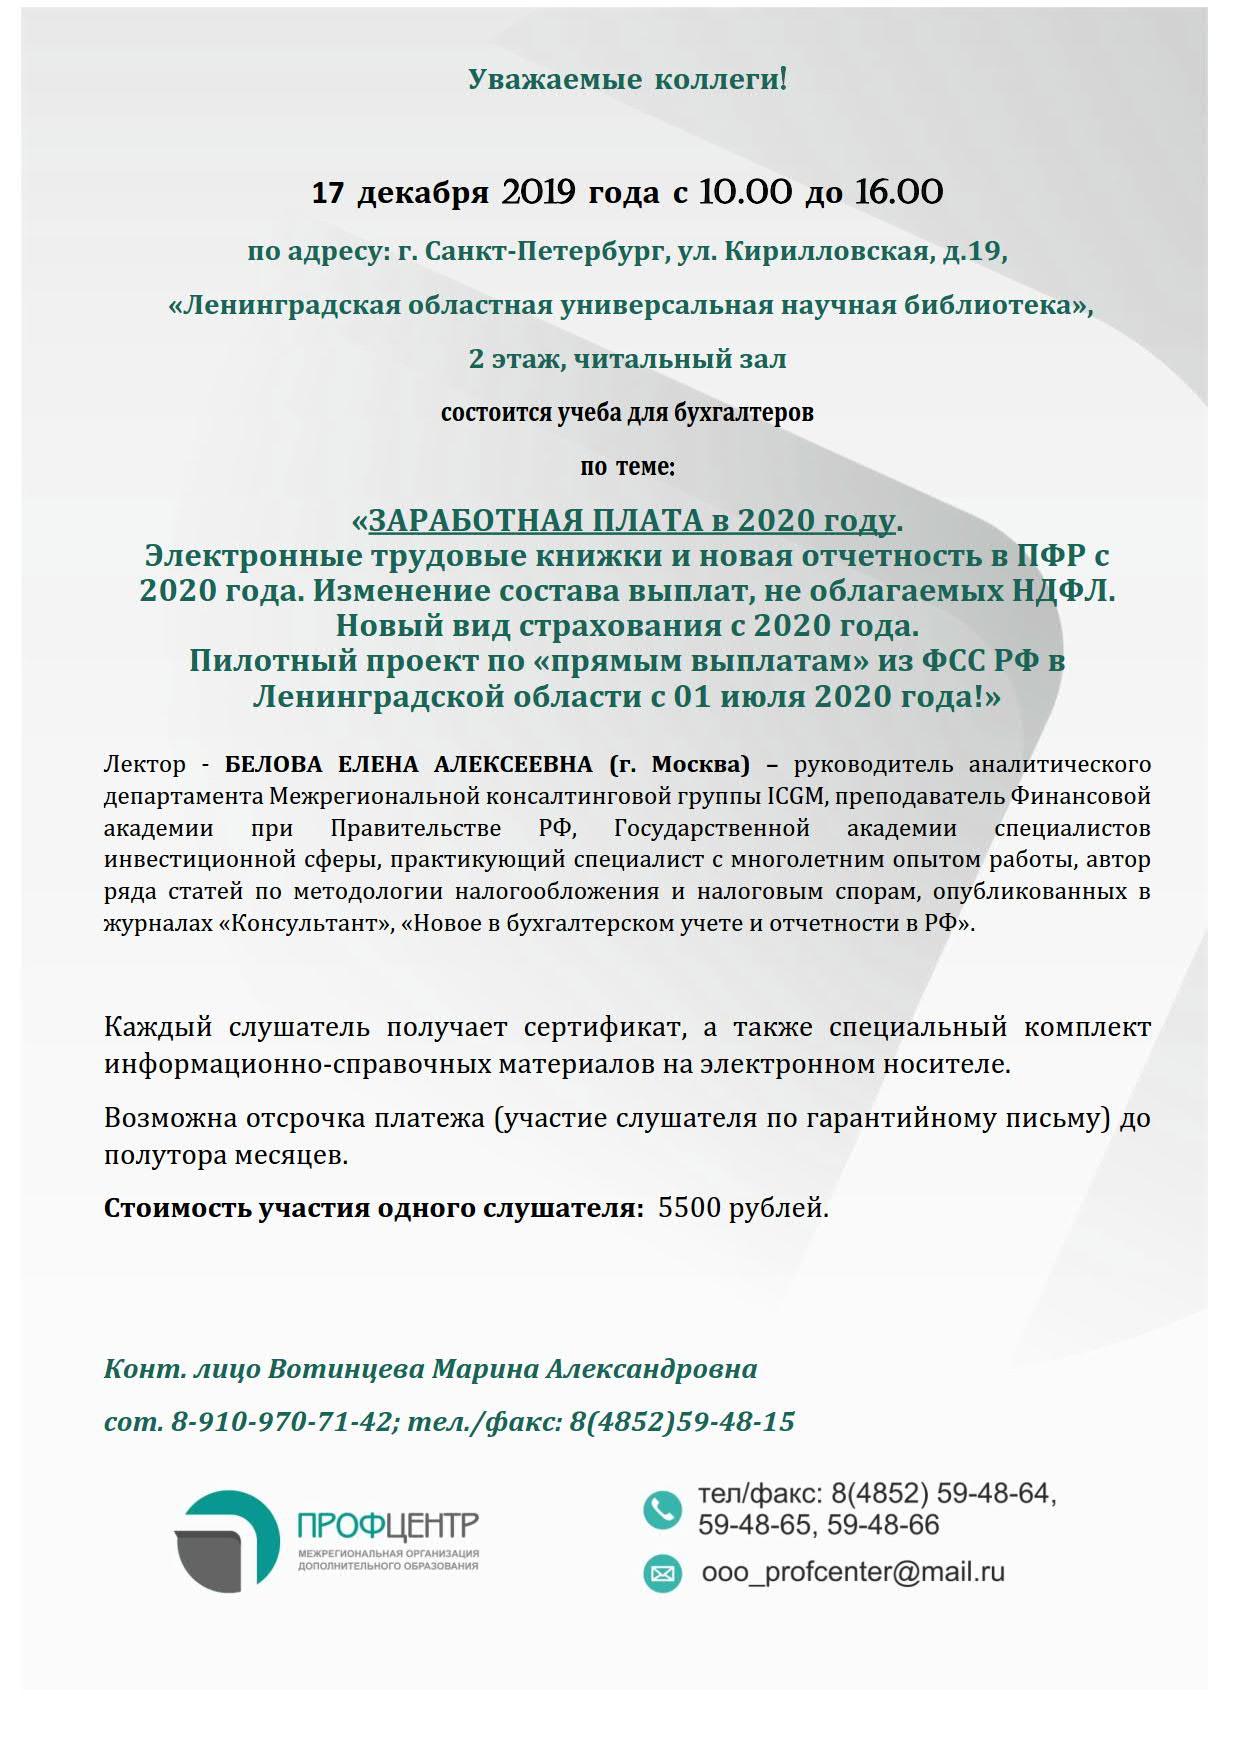 256_СПб_мун. образ_17.12_МА_инф_1